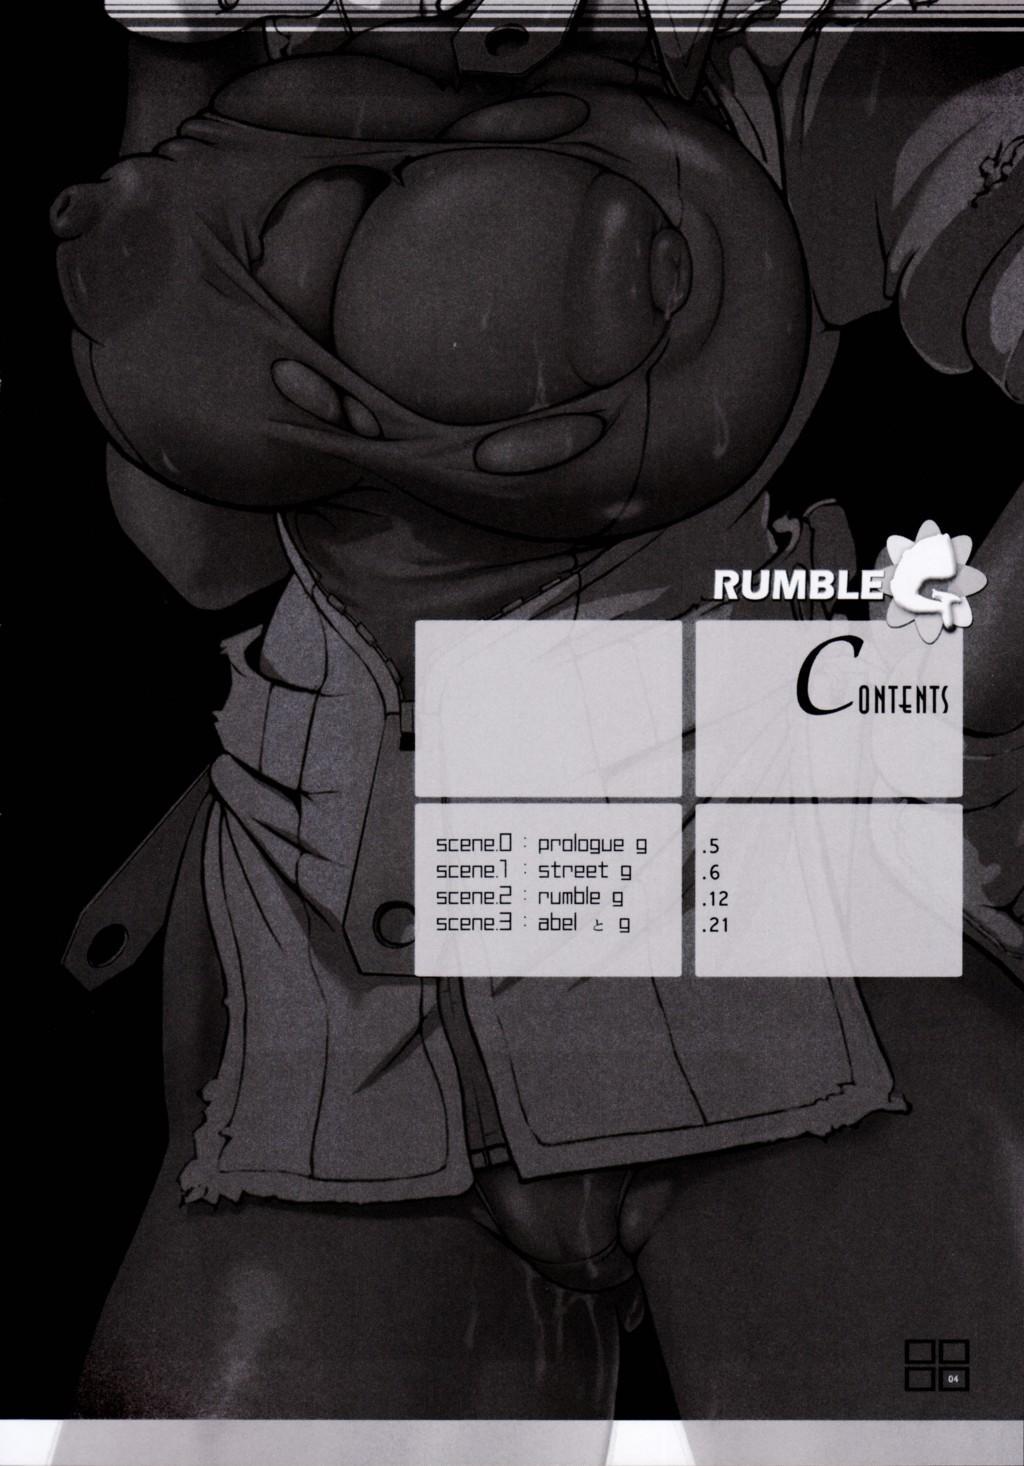 RUMBLE G 2